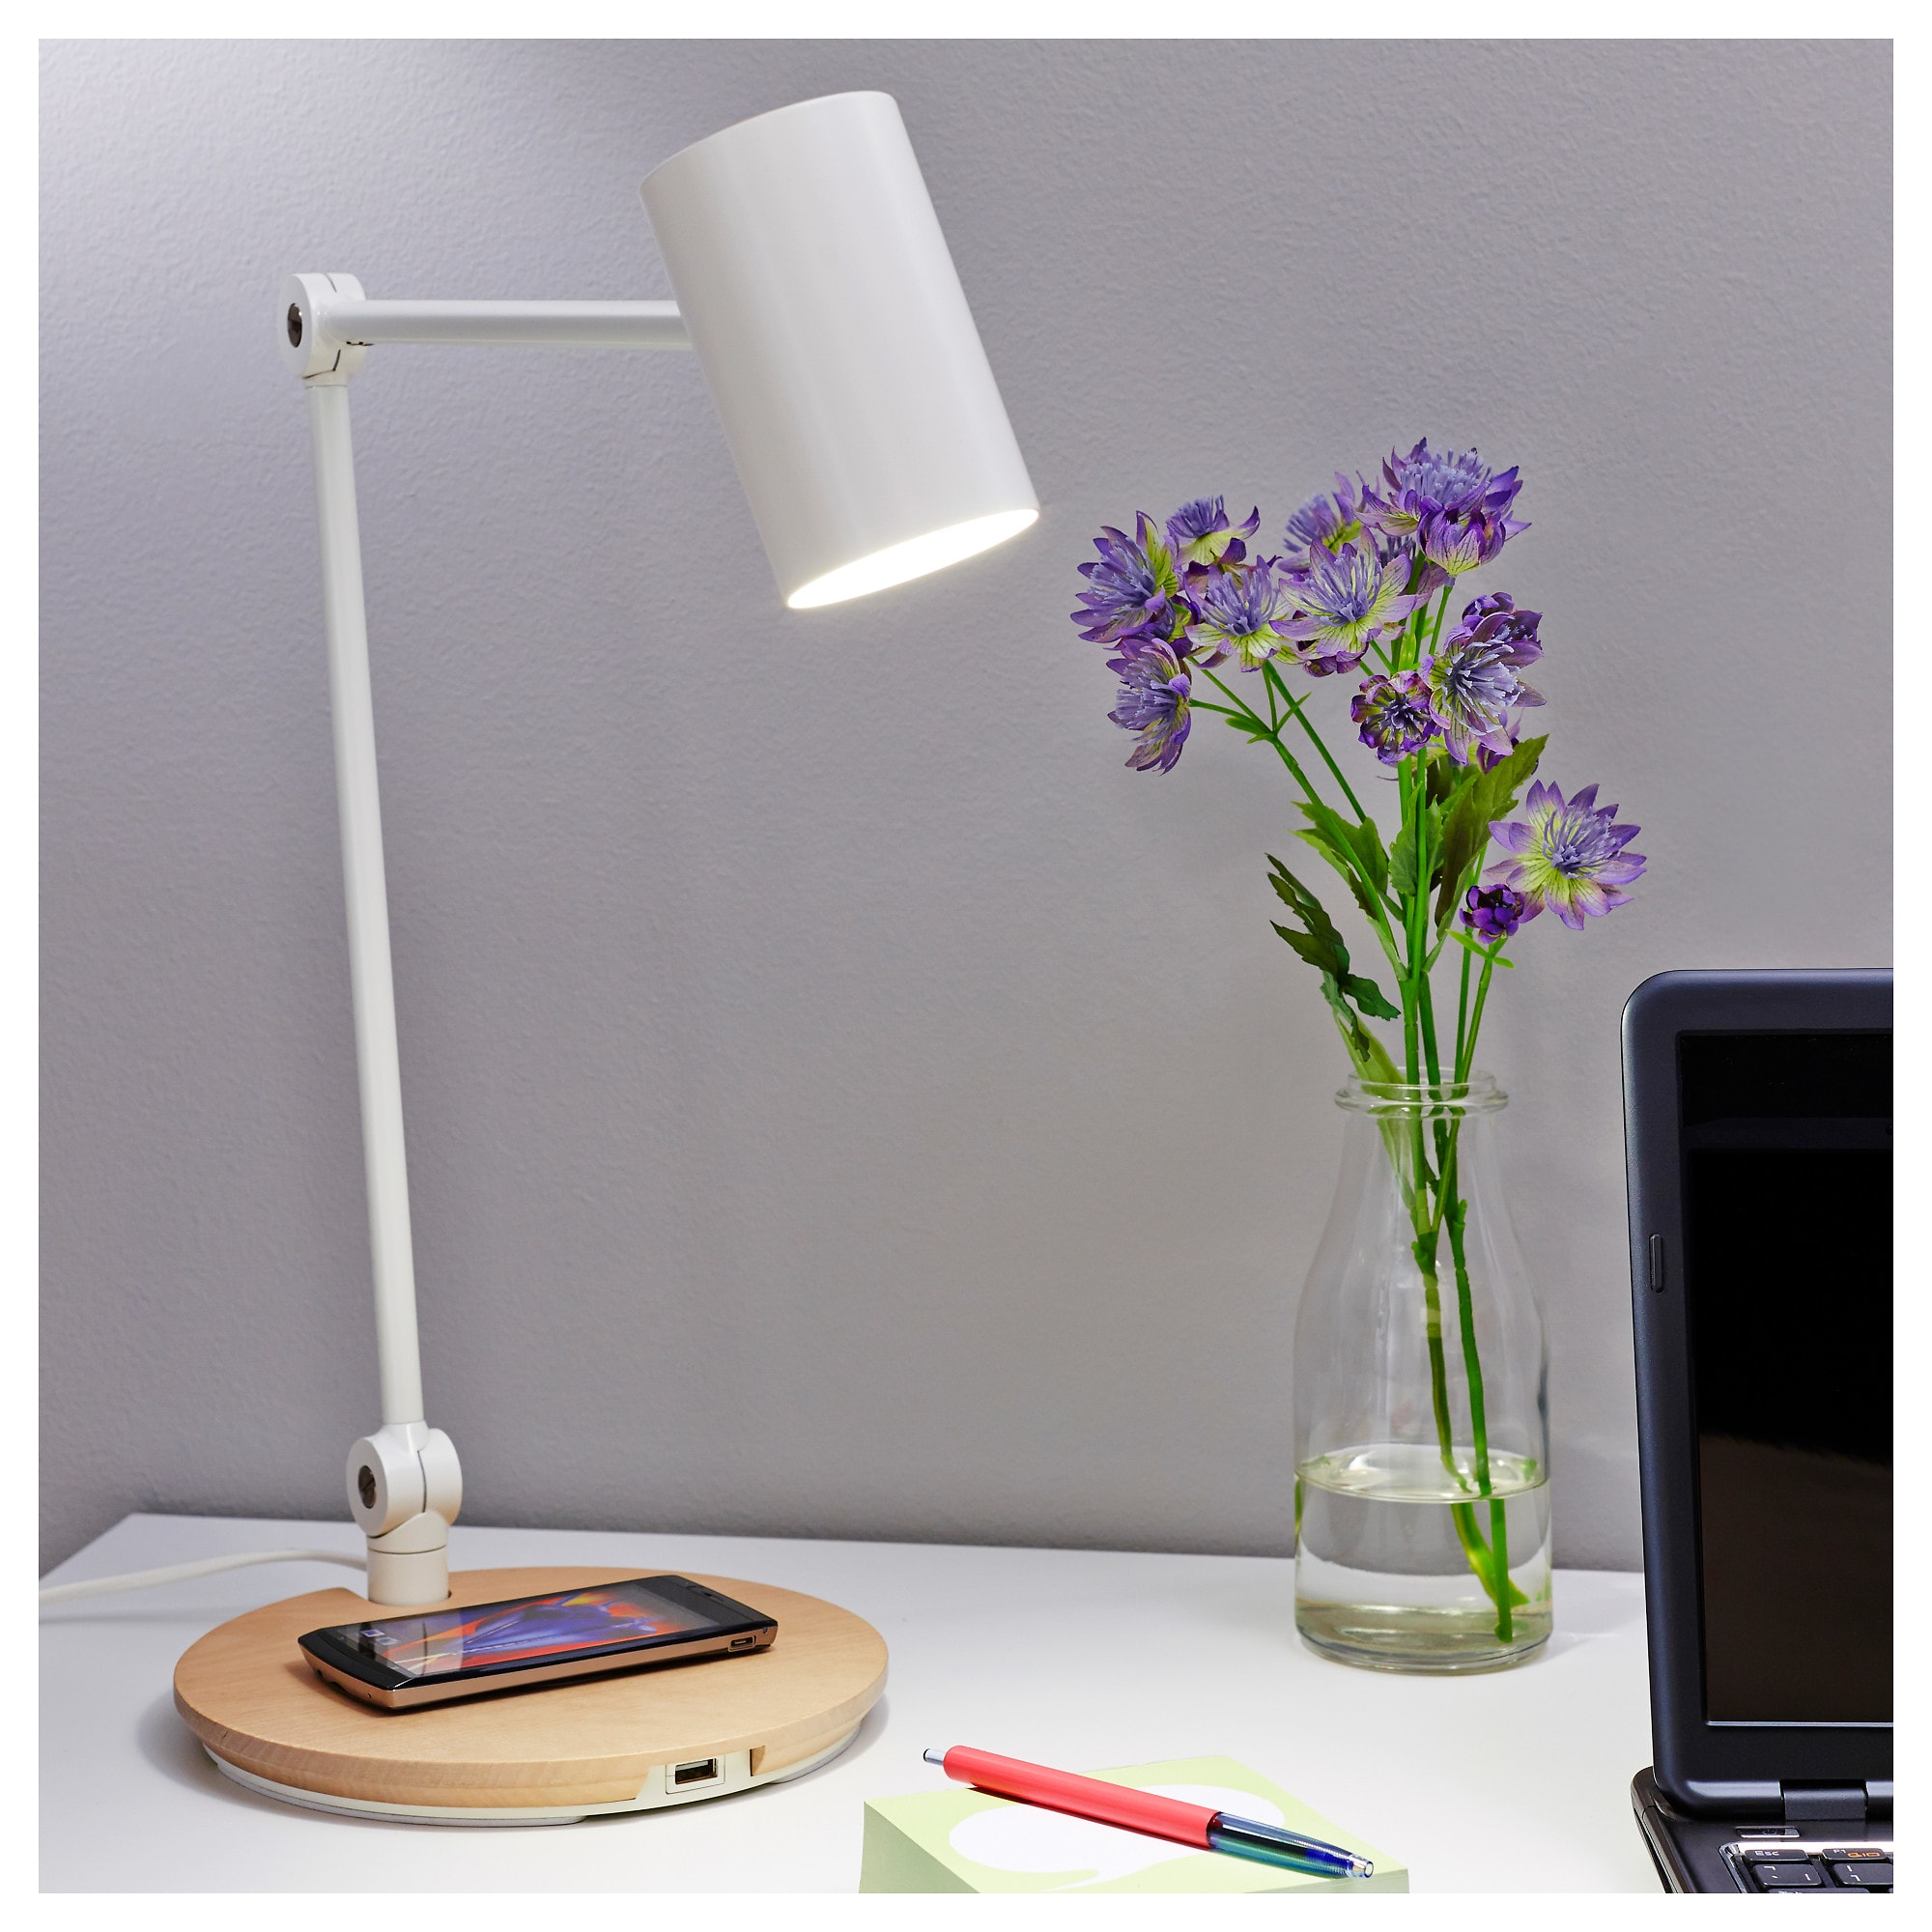 Riggad Led Arbetslampa M Tradlos Laddning Vit Ikea Work Lamp Lamp Desk Lamp